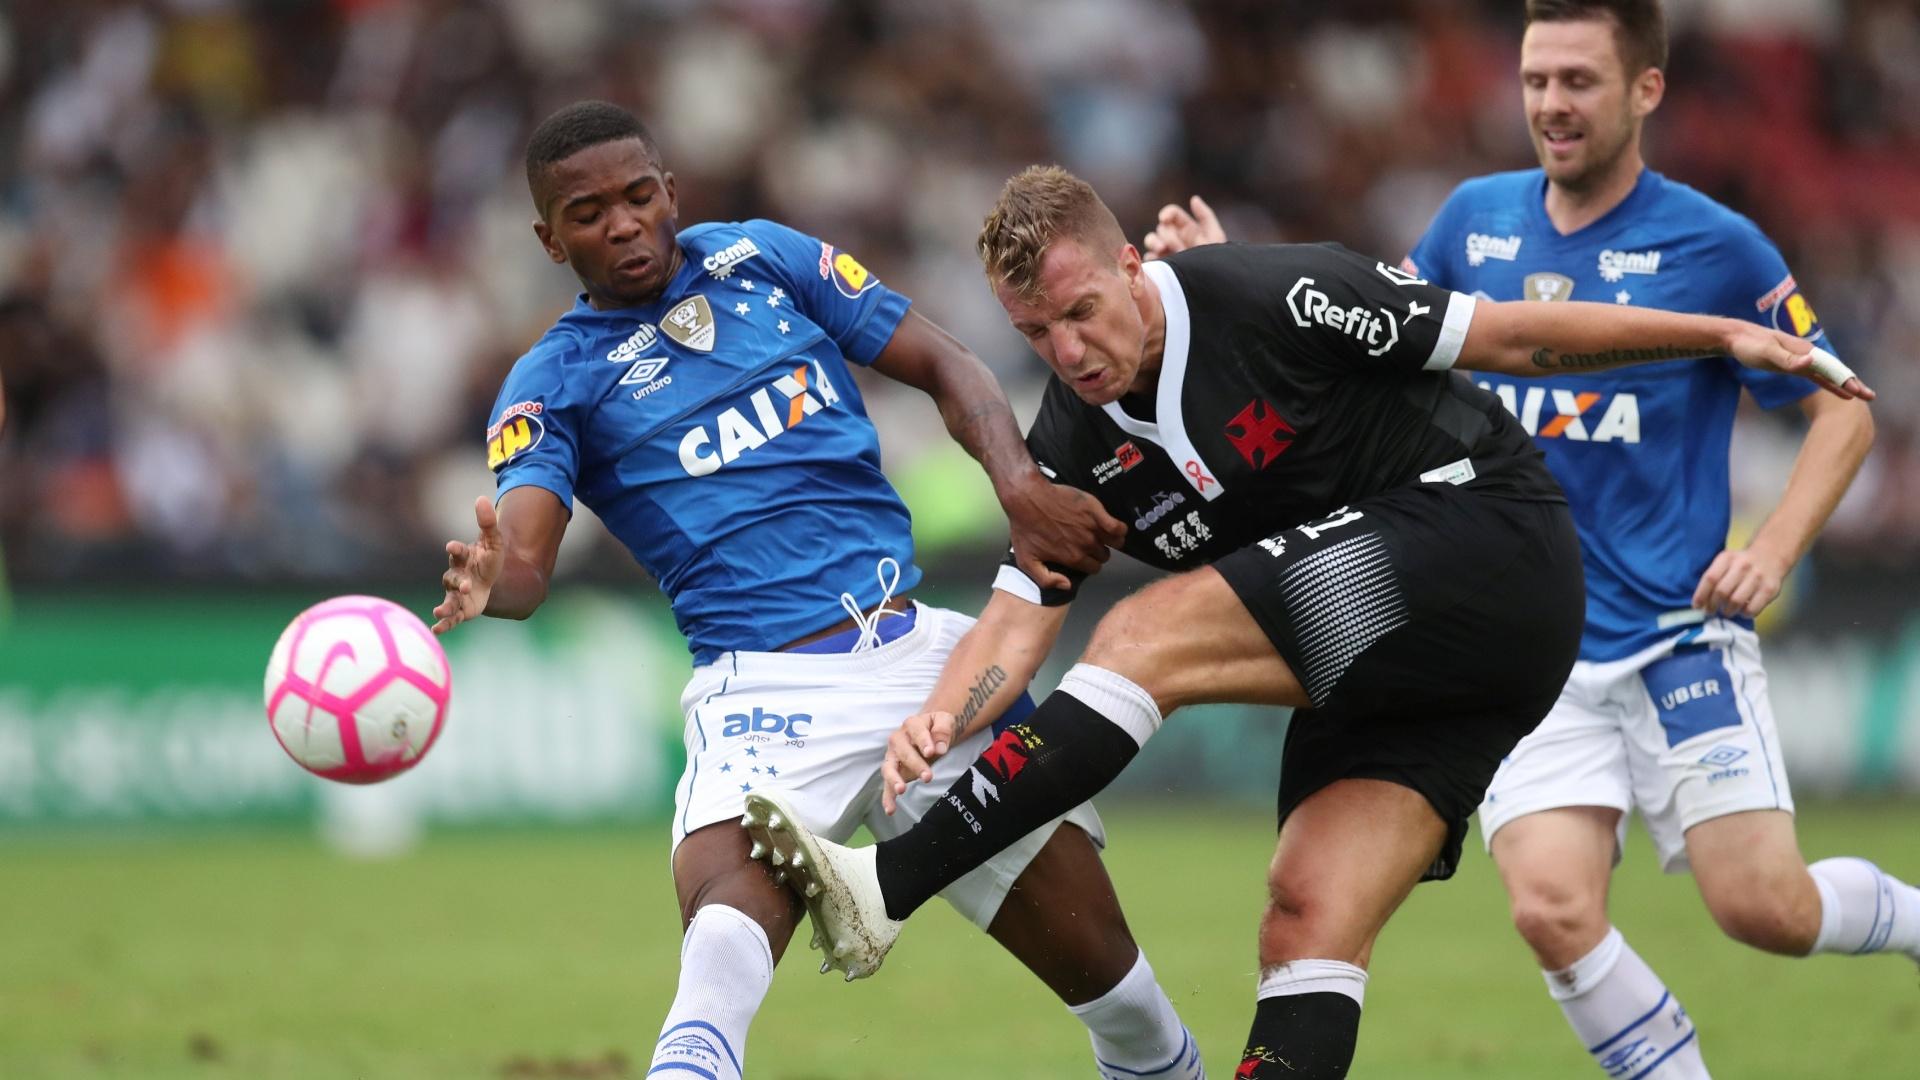 Maxi López tenta chute durante Vasco x Cruzeiro no Campeonato Brasileiro